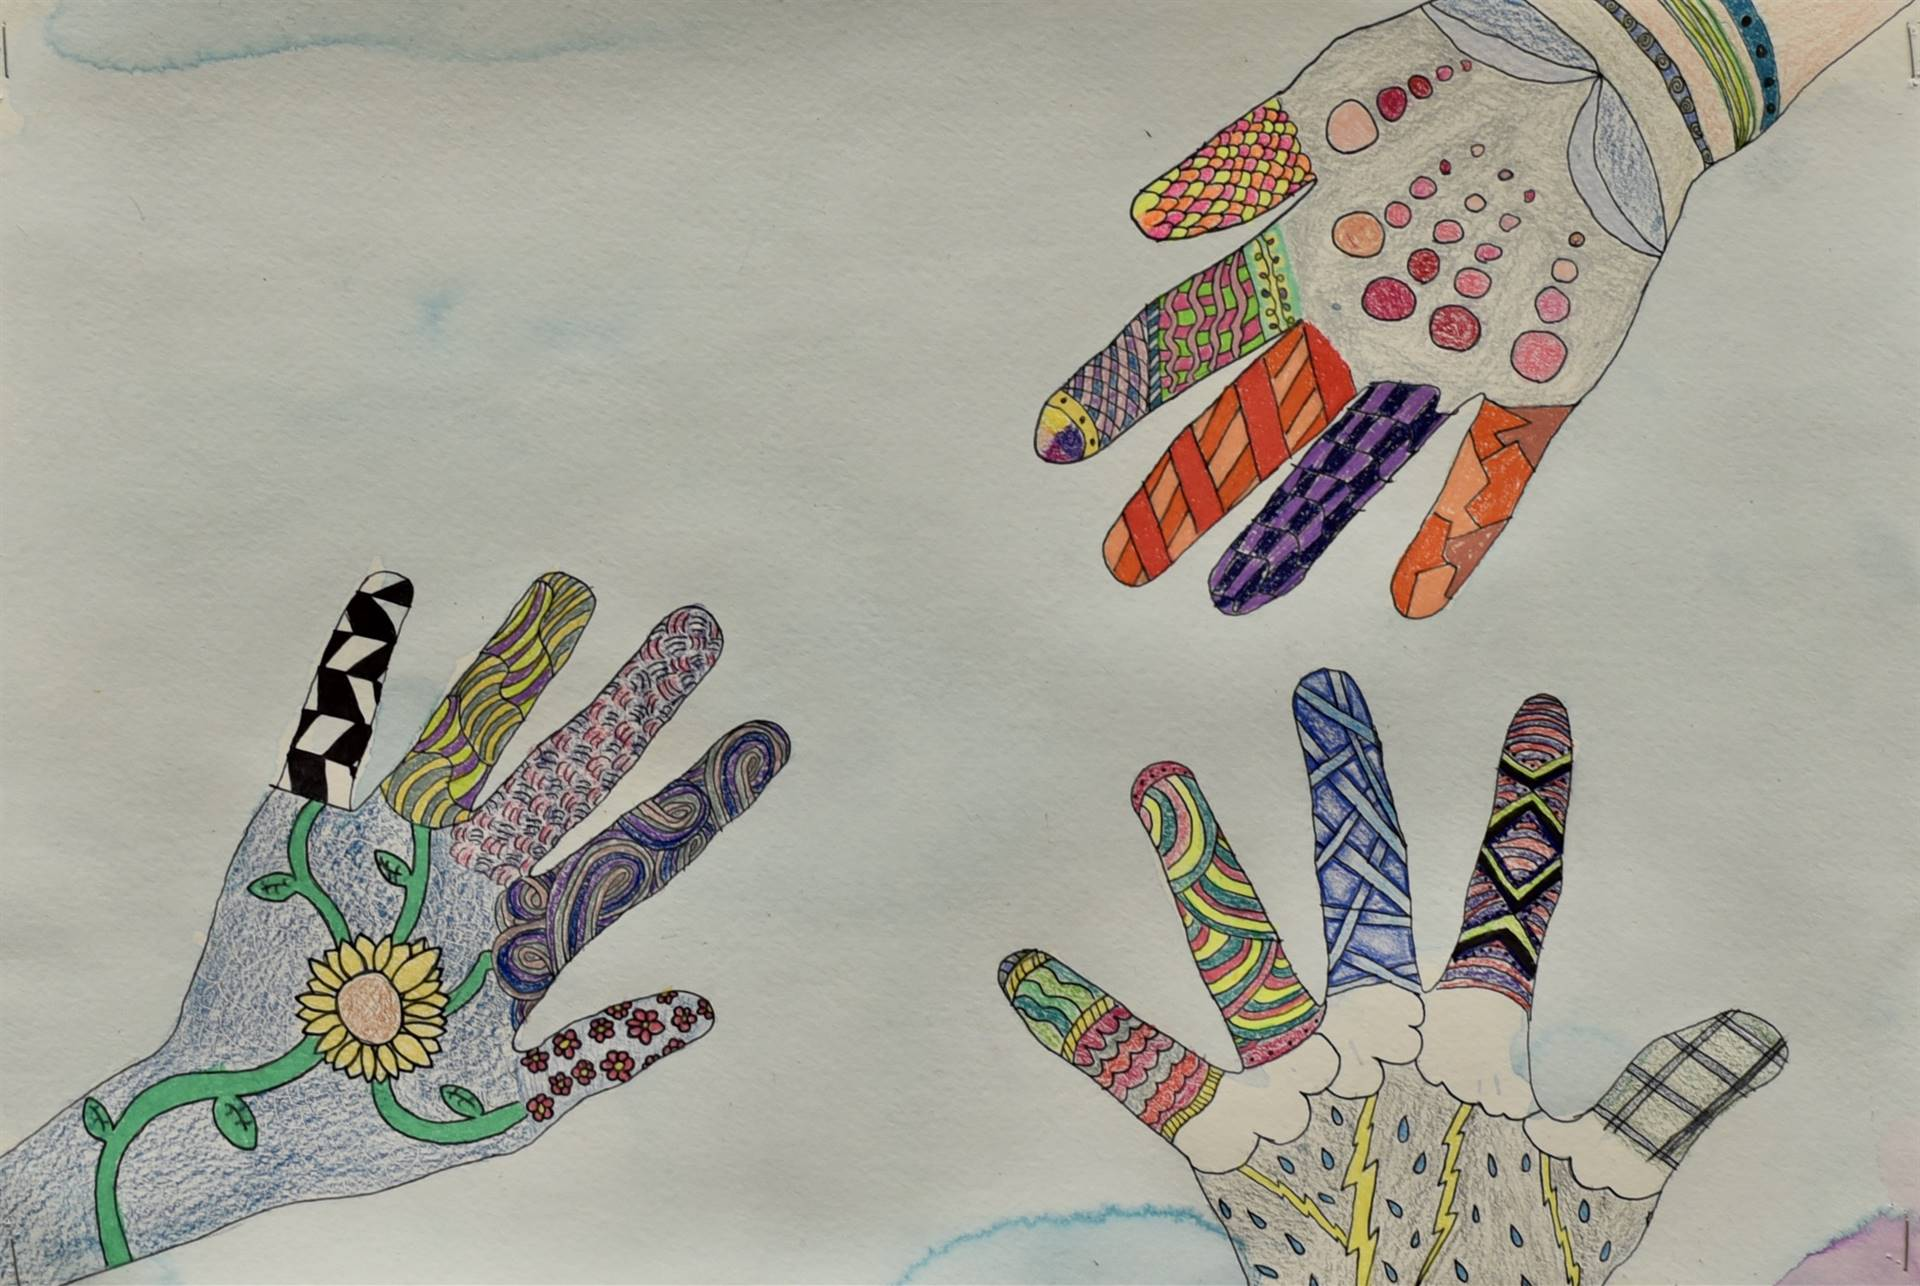 Brecksville-Broadview Hts. Middle School Art Projects 50